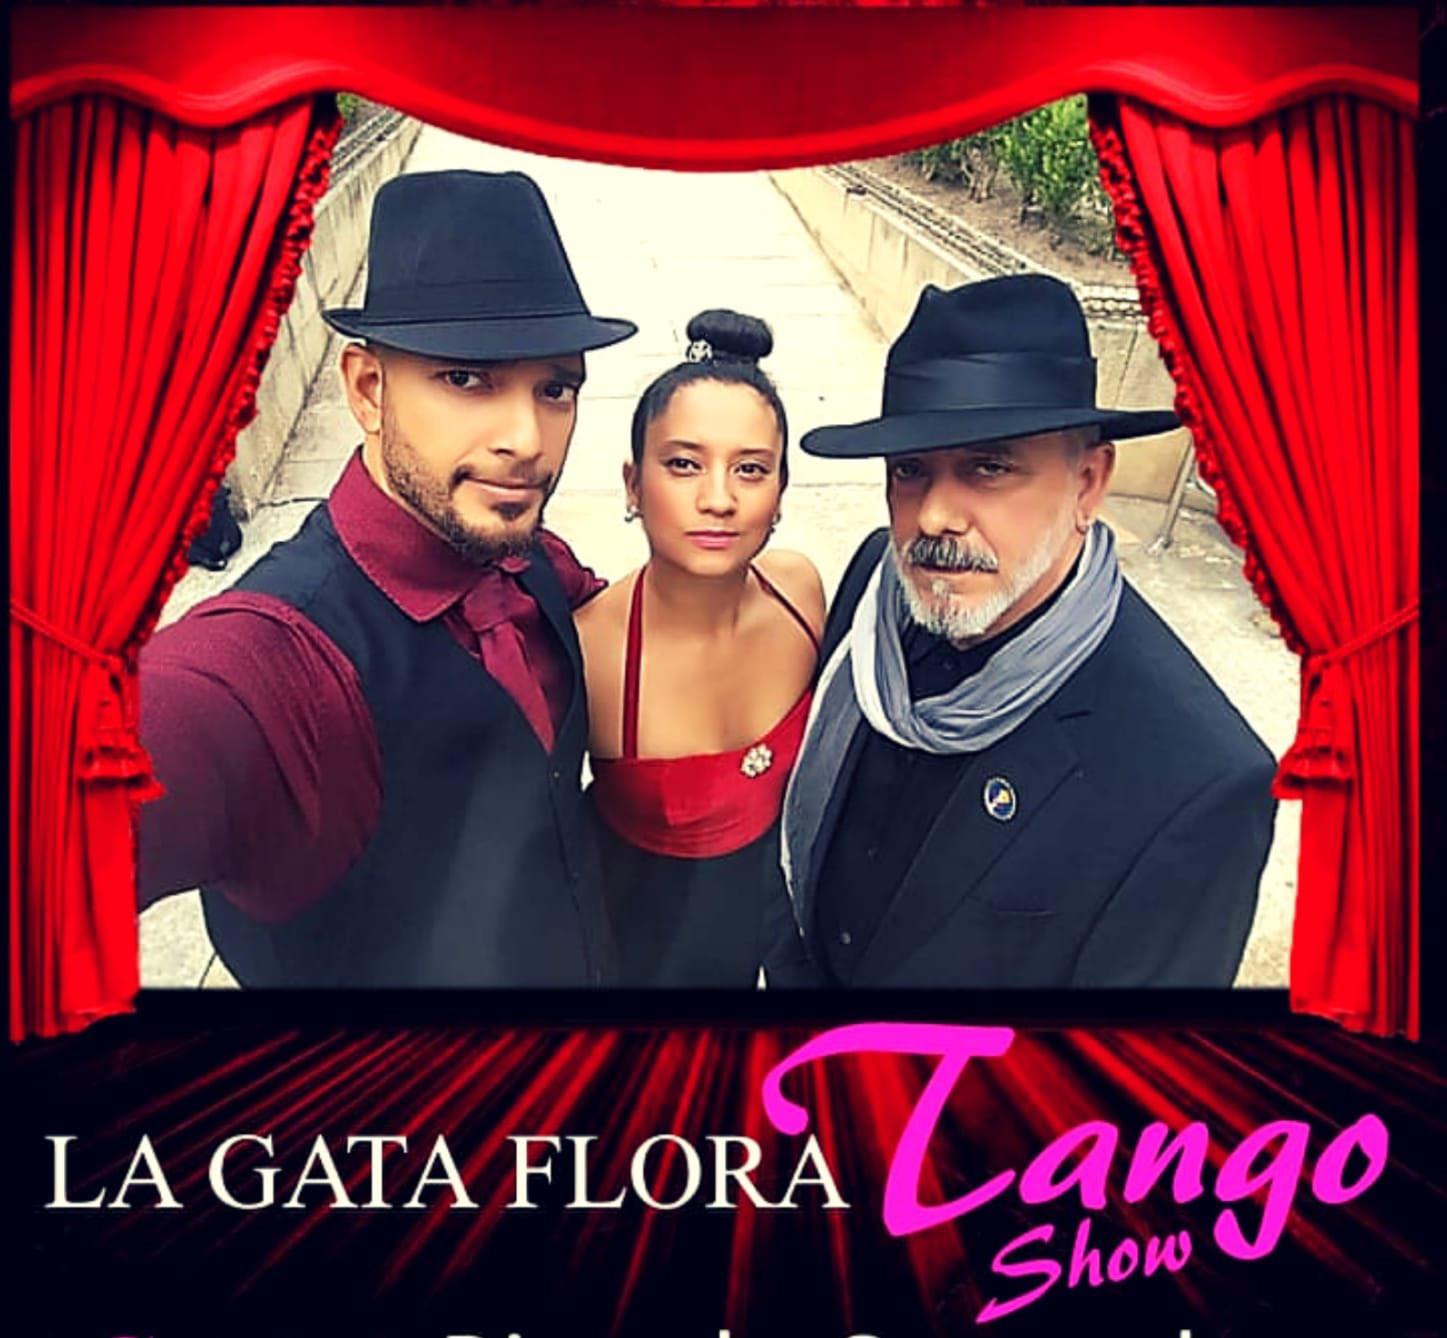 La Gata Flora